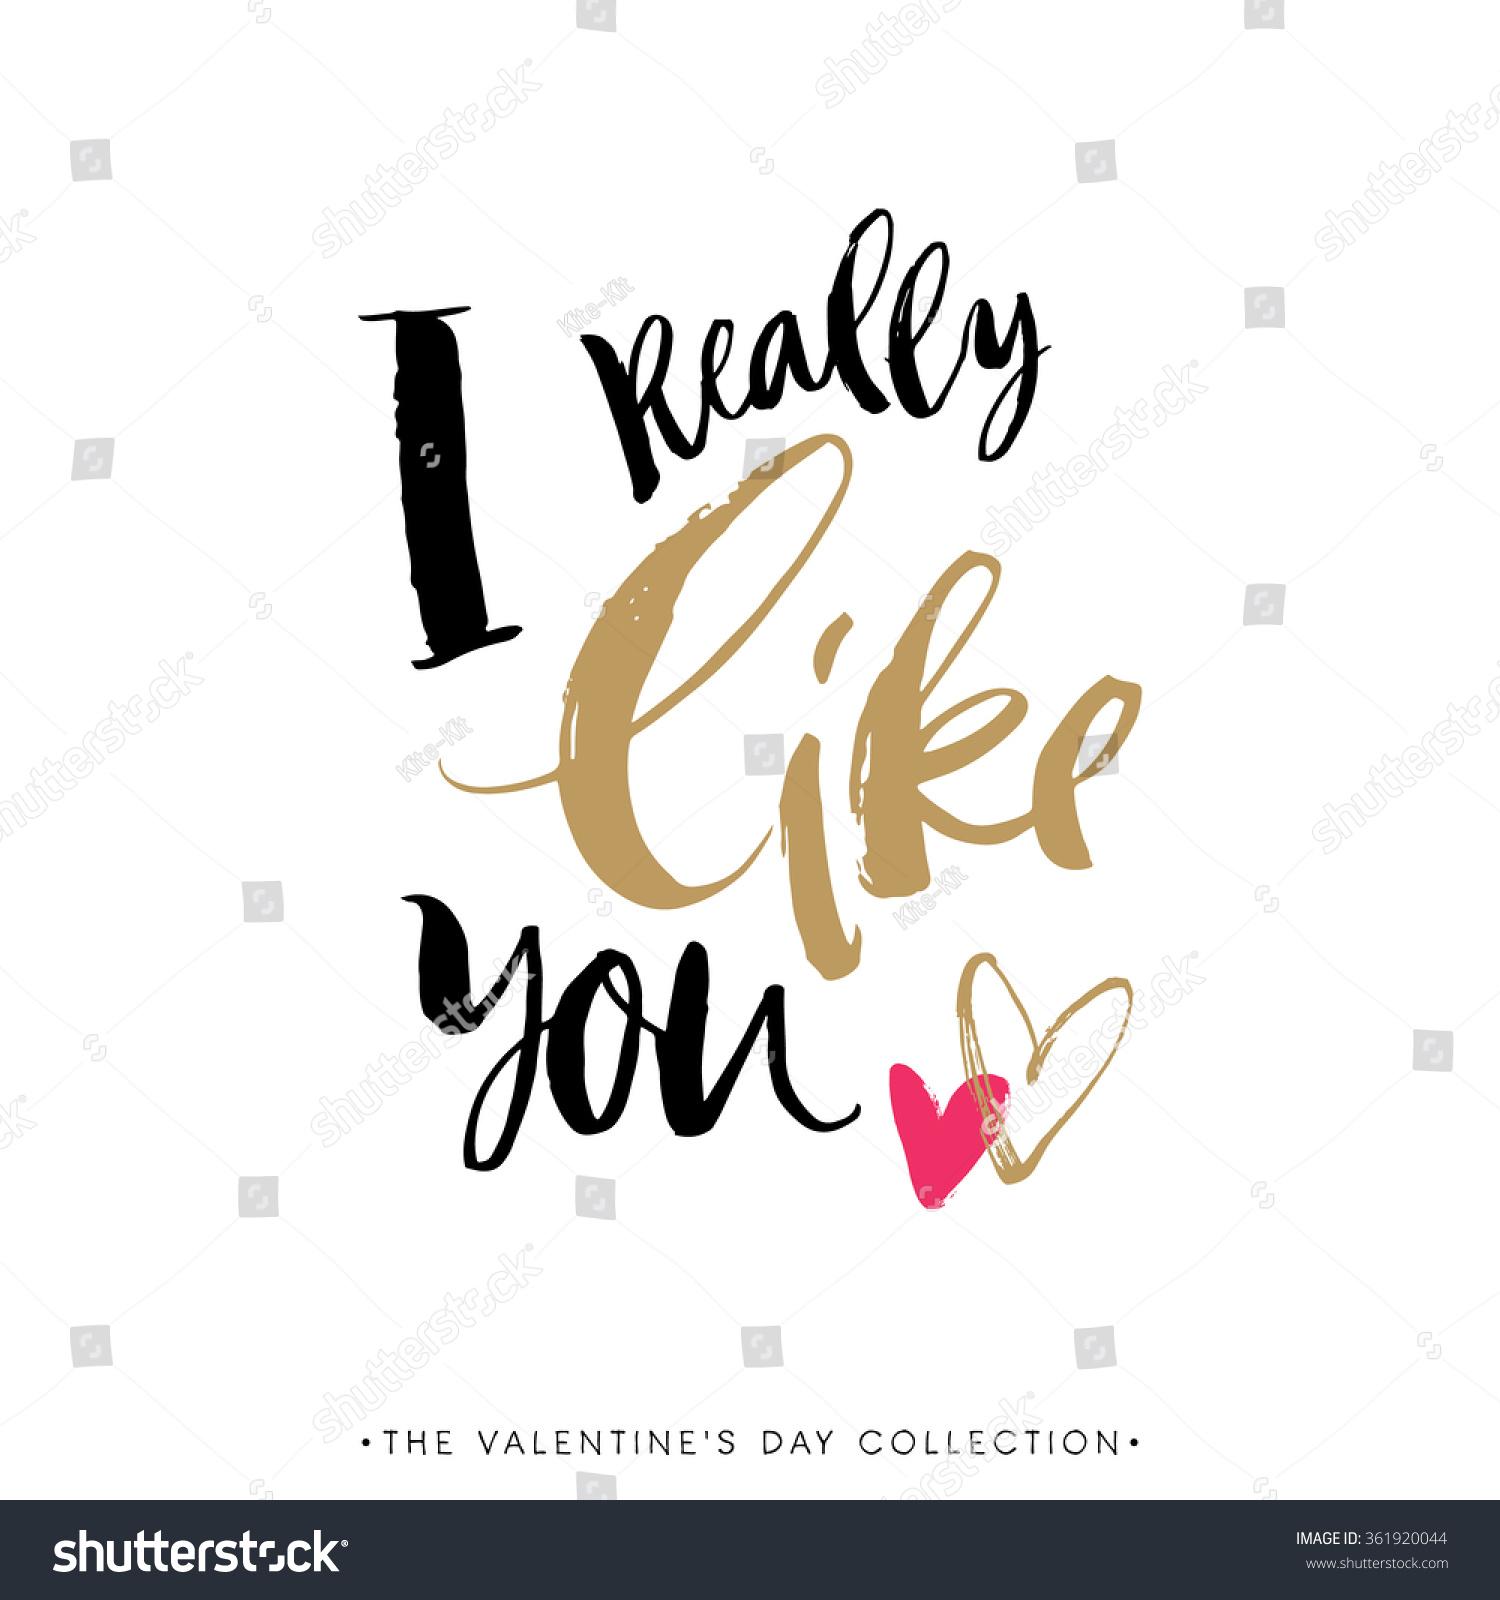 Really Like You Valentines Day Greeting Stock-Vektorgrafik 361920044 ...